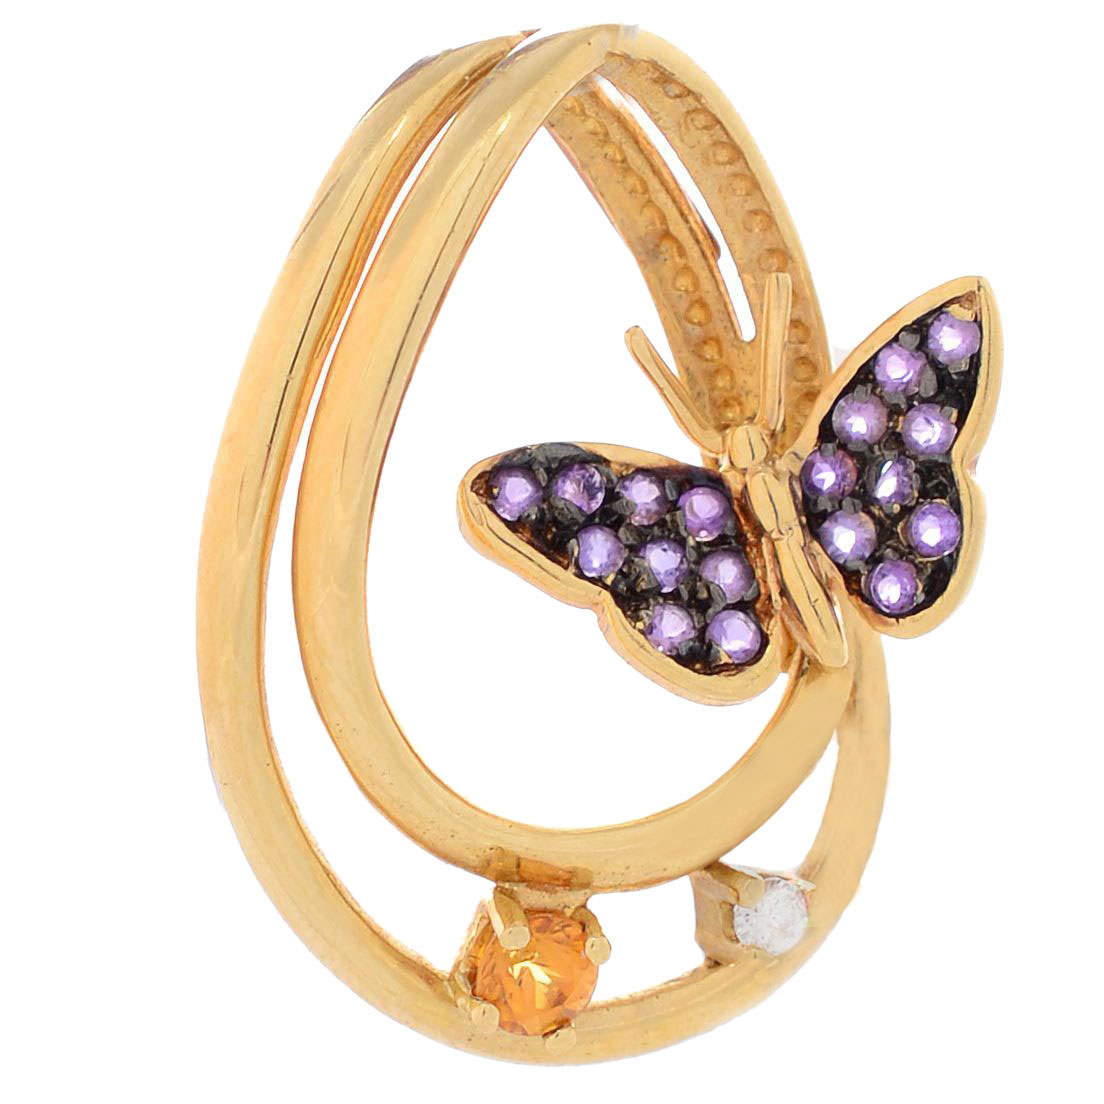 Подвеска Roberto Bravo Monarch Butterflies с аметистами цитрином и бриллиантом